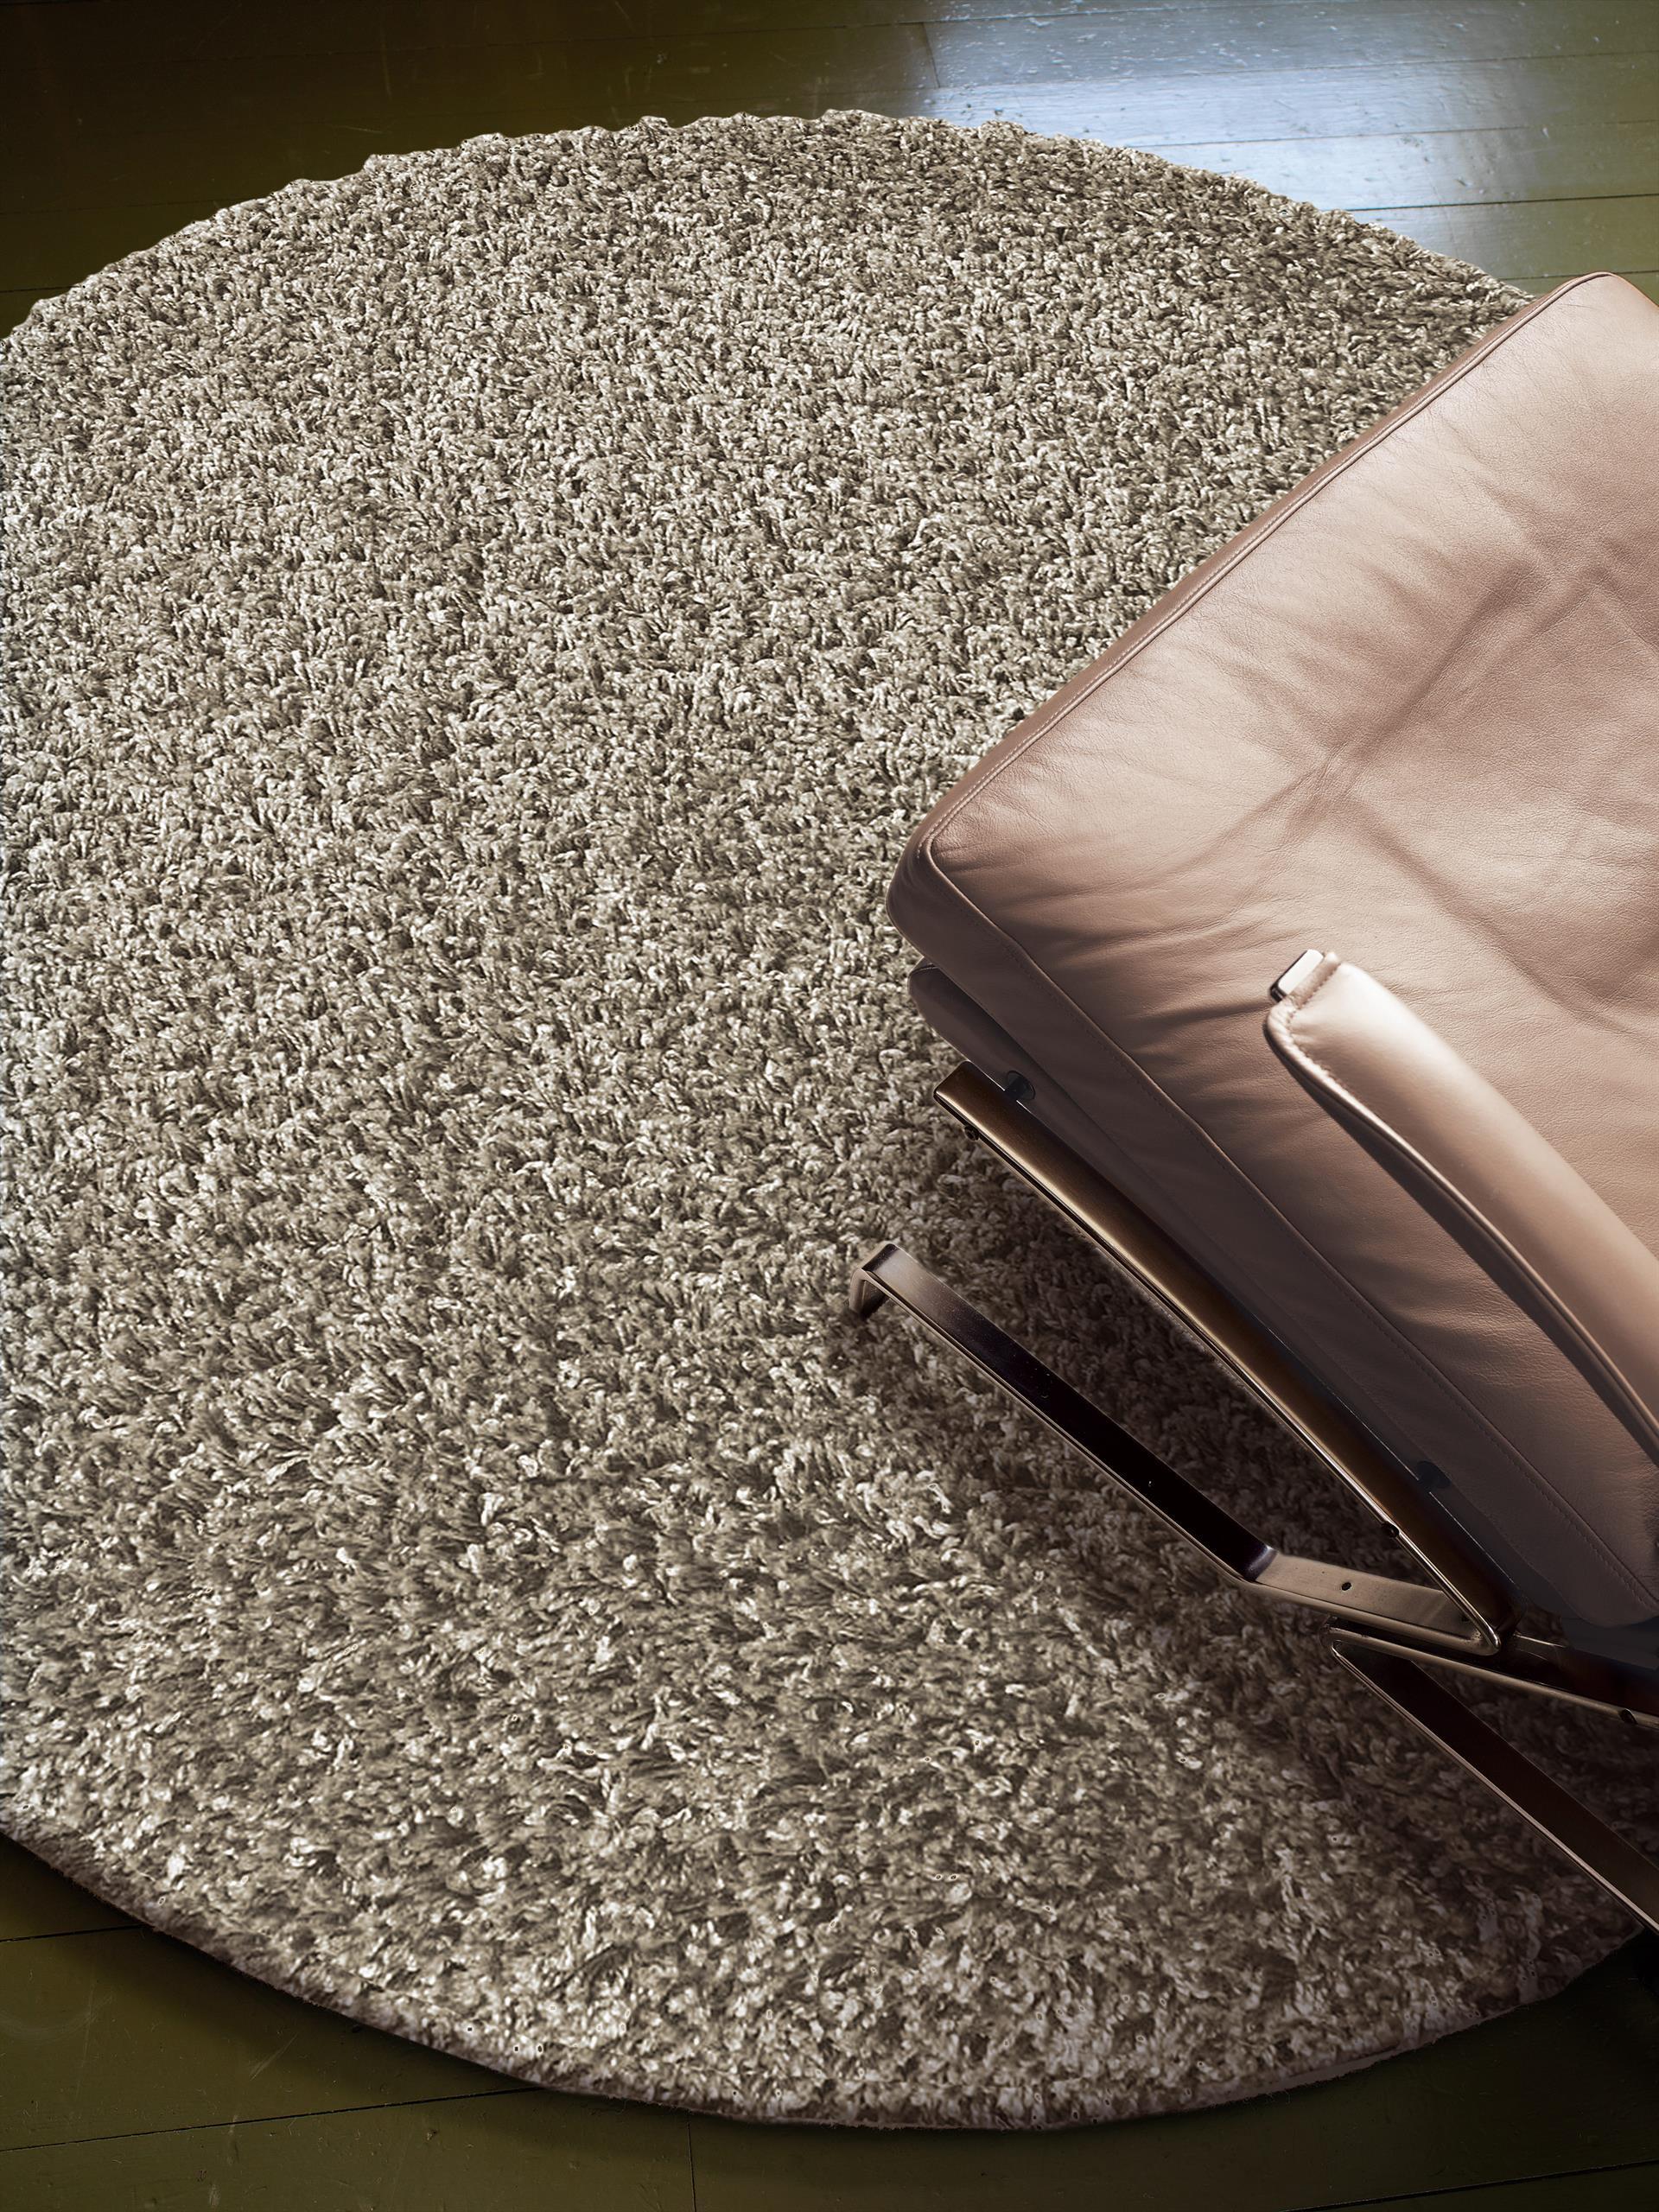 hochflor teppich hellgrau lars contzen teppich colourcourage hochflor hellgrau teppich. Black Bedroom Furniture Sets. Home Design Ideas